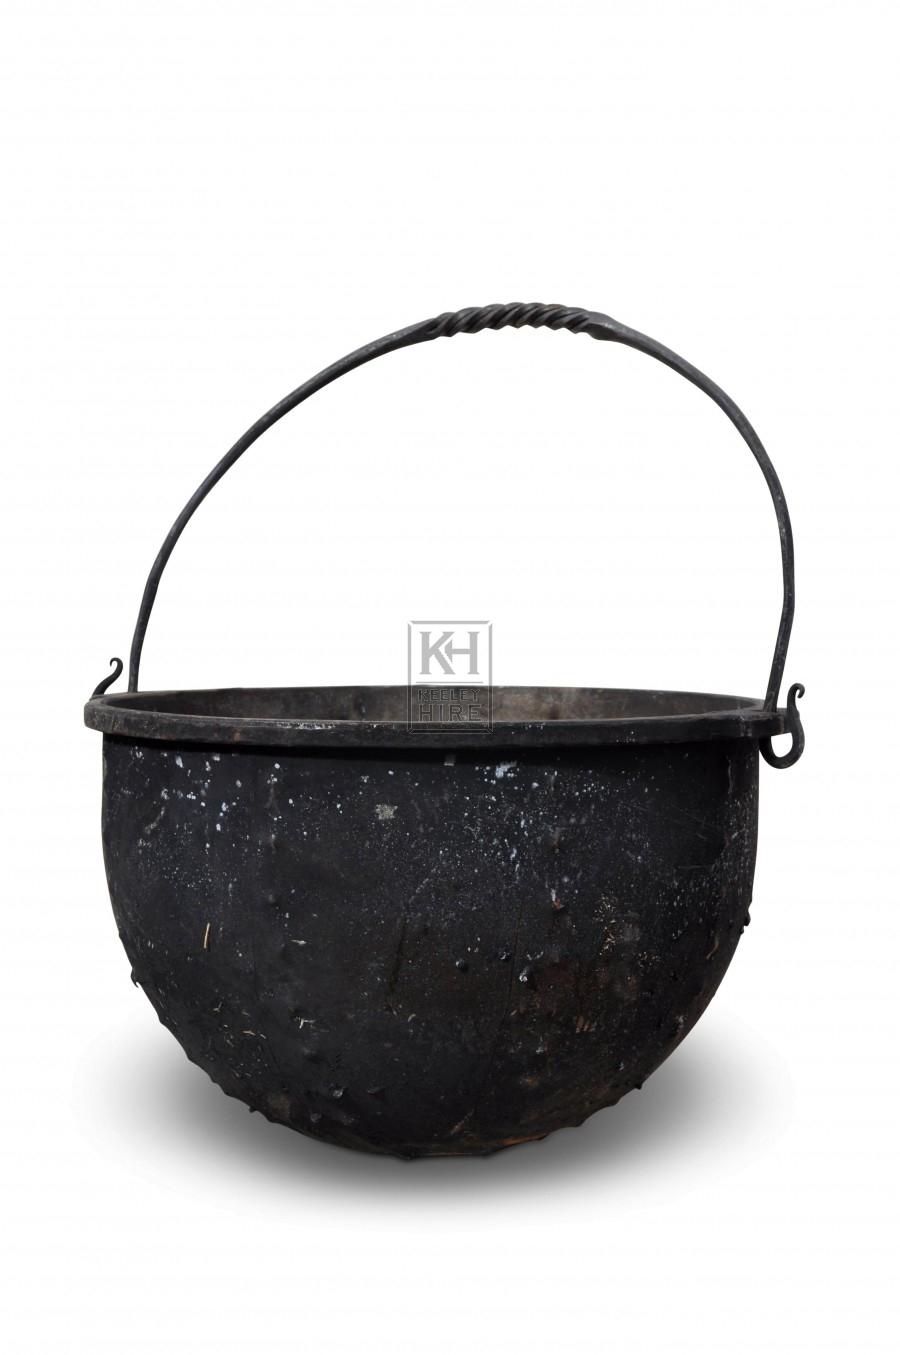 Medium Iron cooking pot with handle